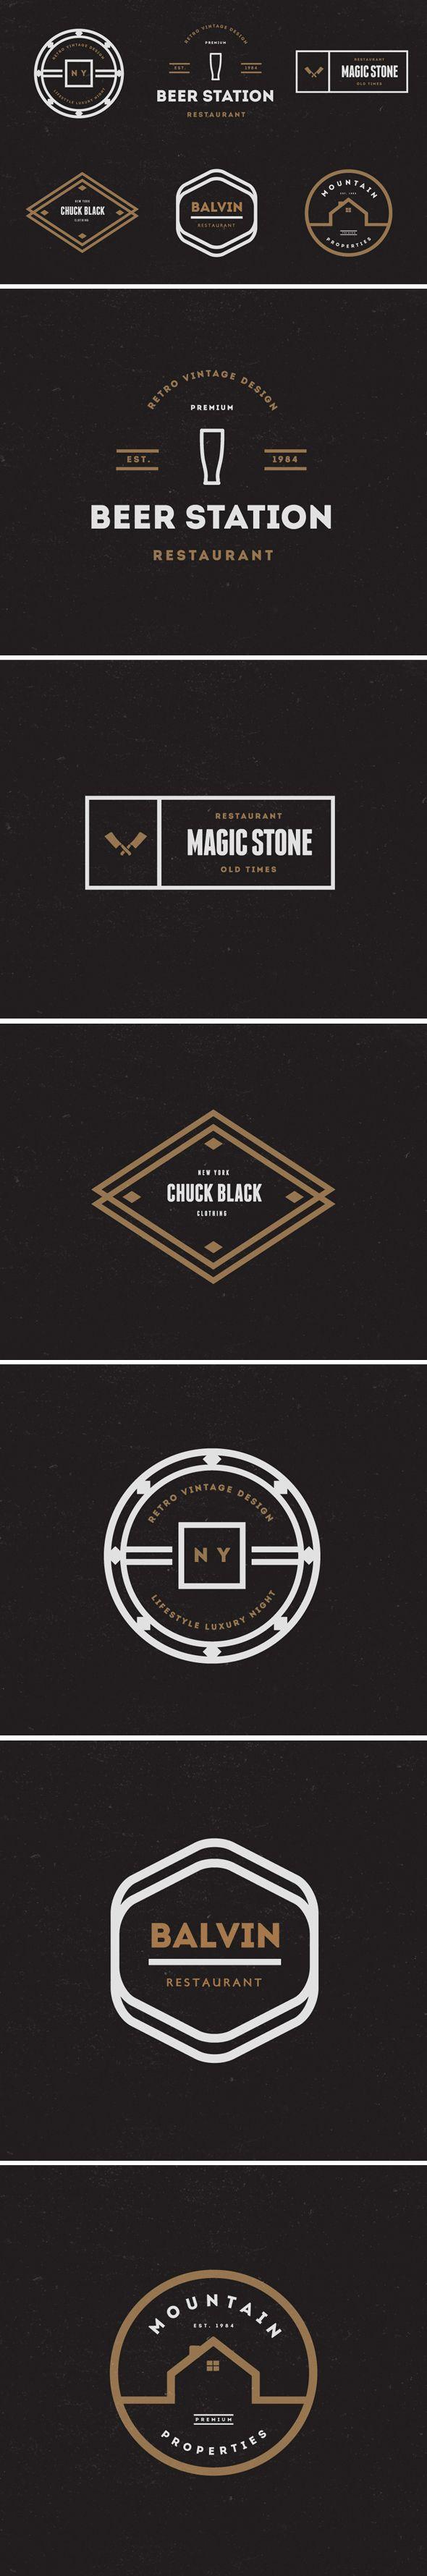 Vintage Logos Badges Vol 20 On Behance